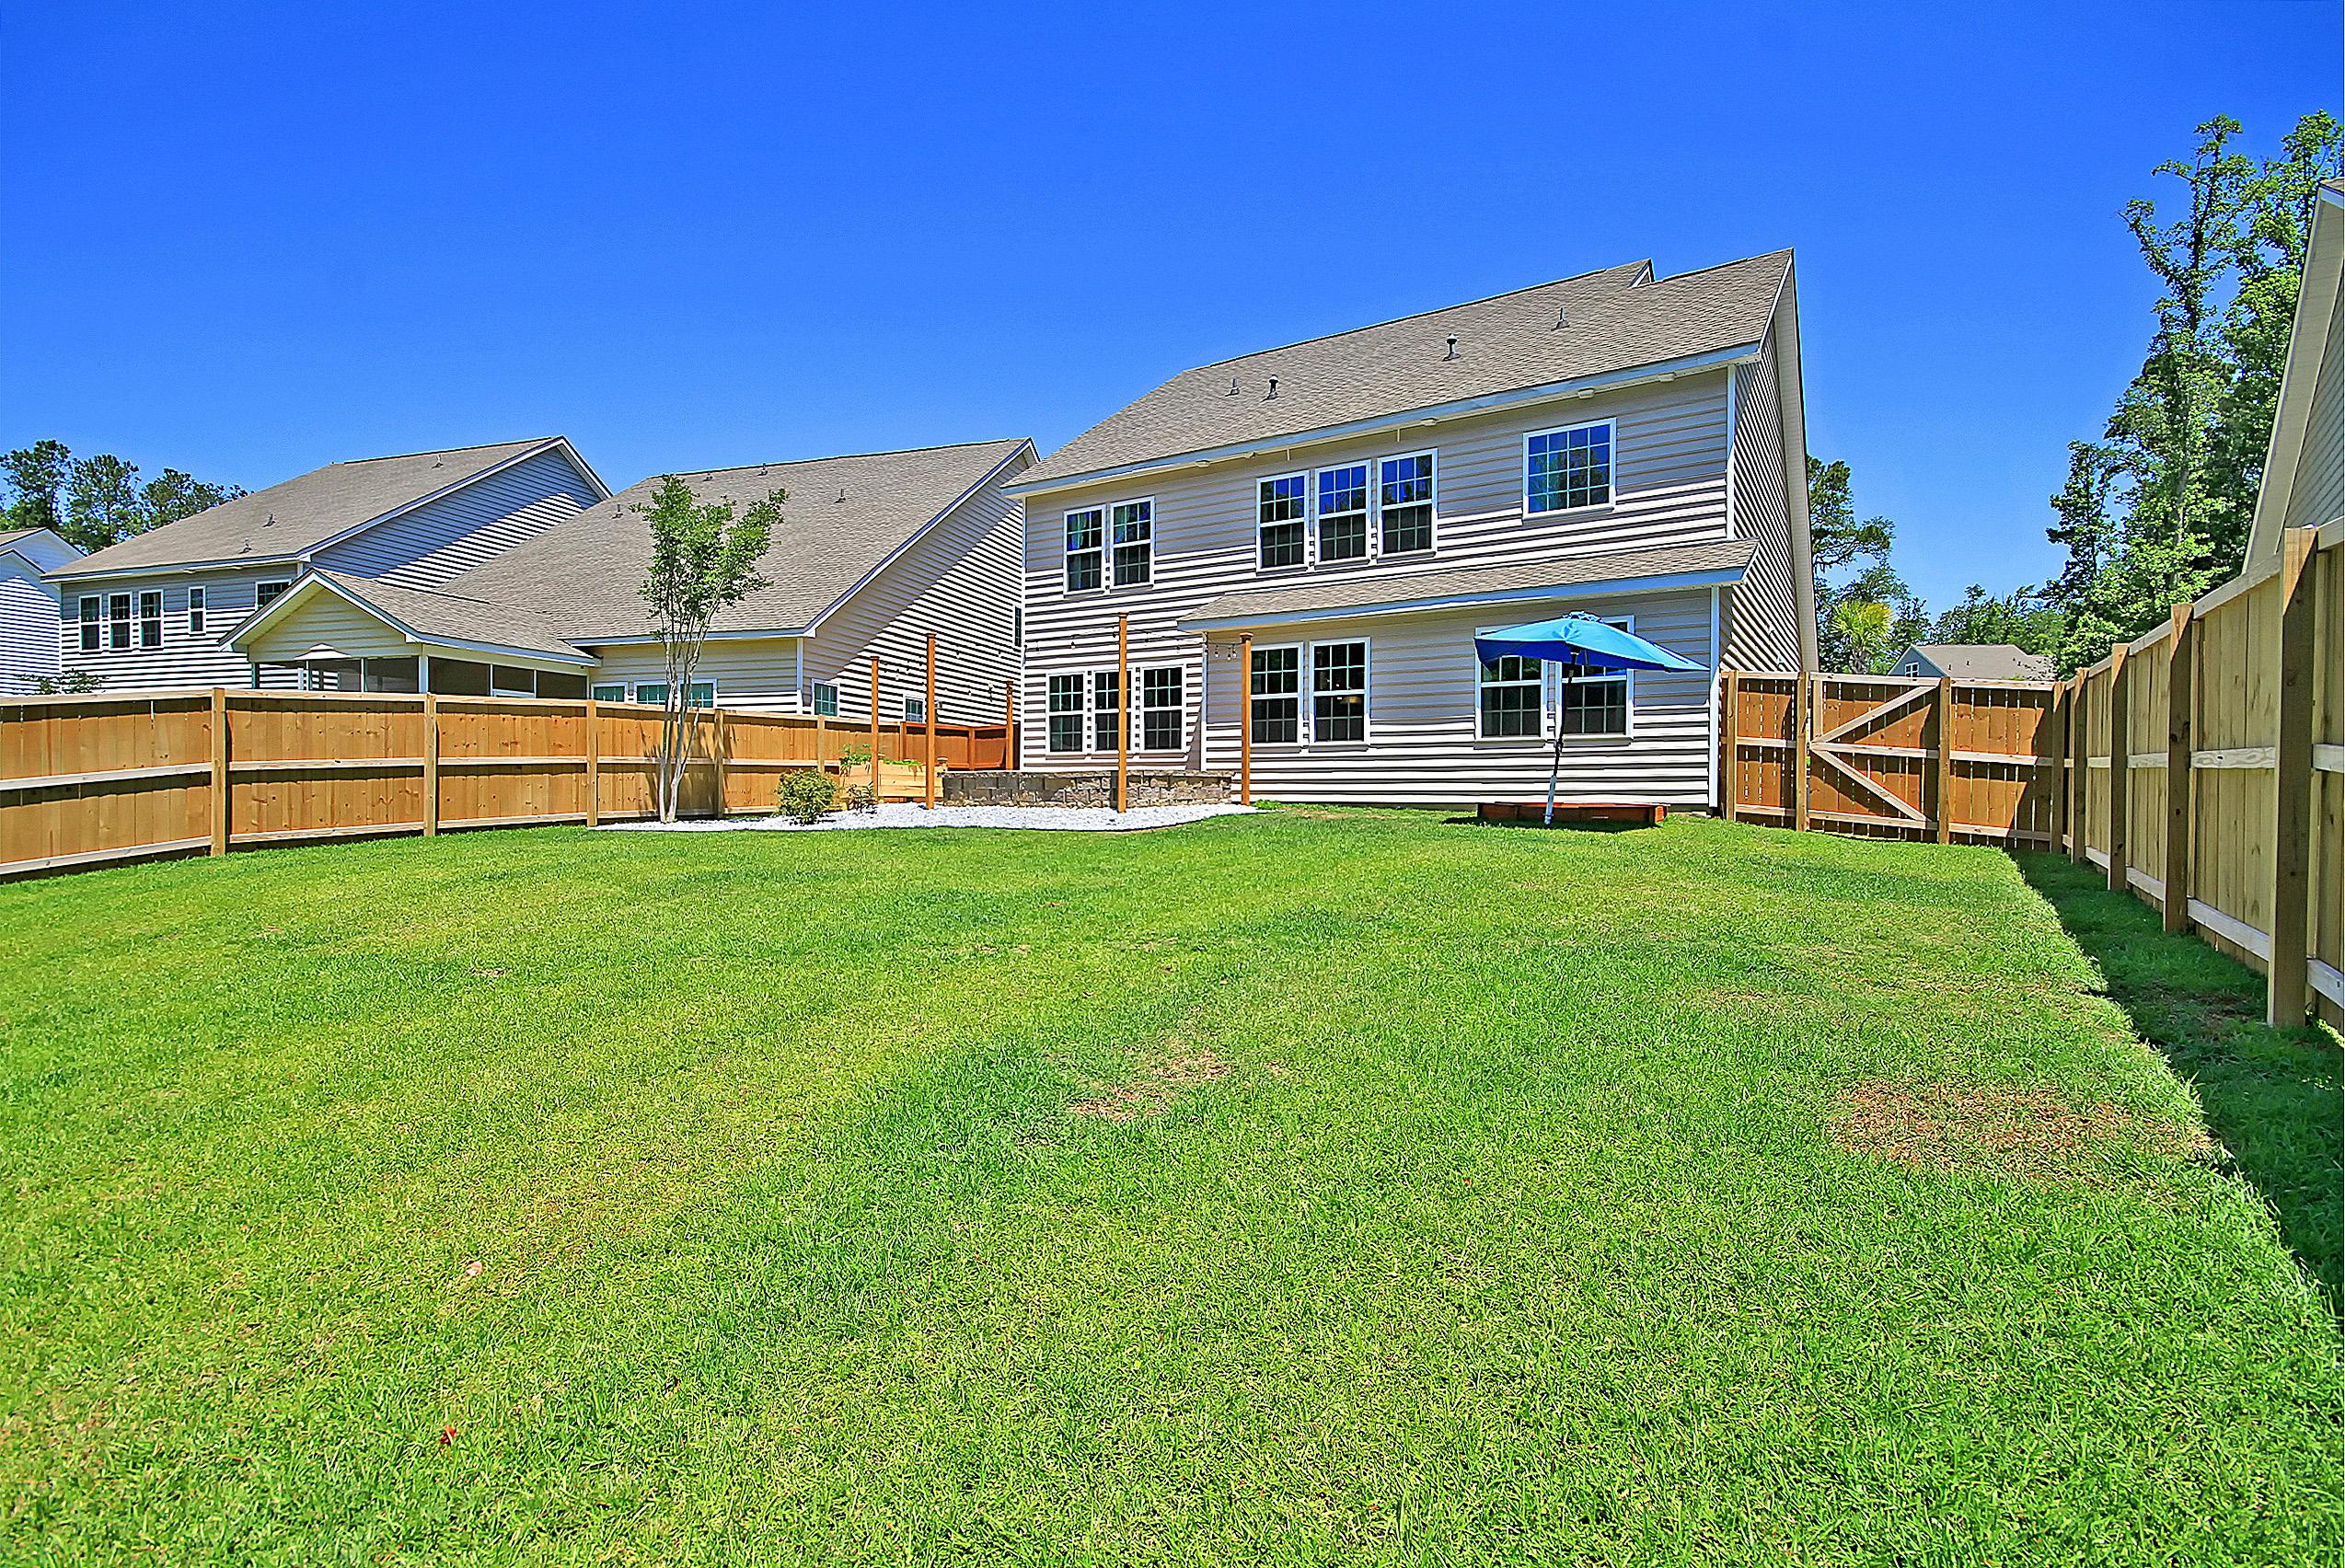 9710 Shortleaf Pine Drive Ladson, SC 29456